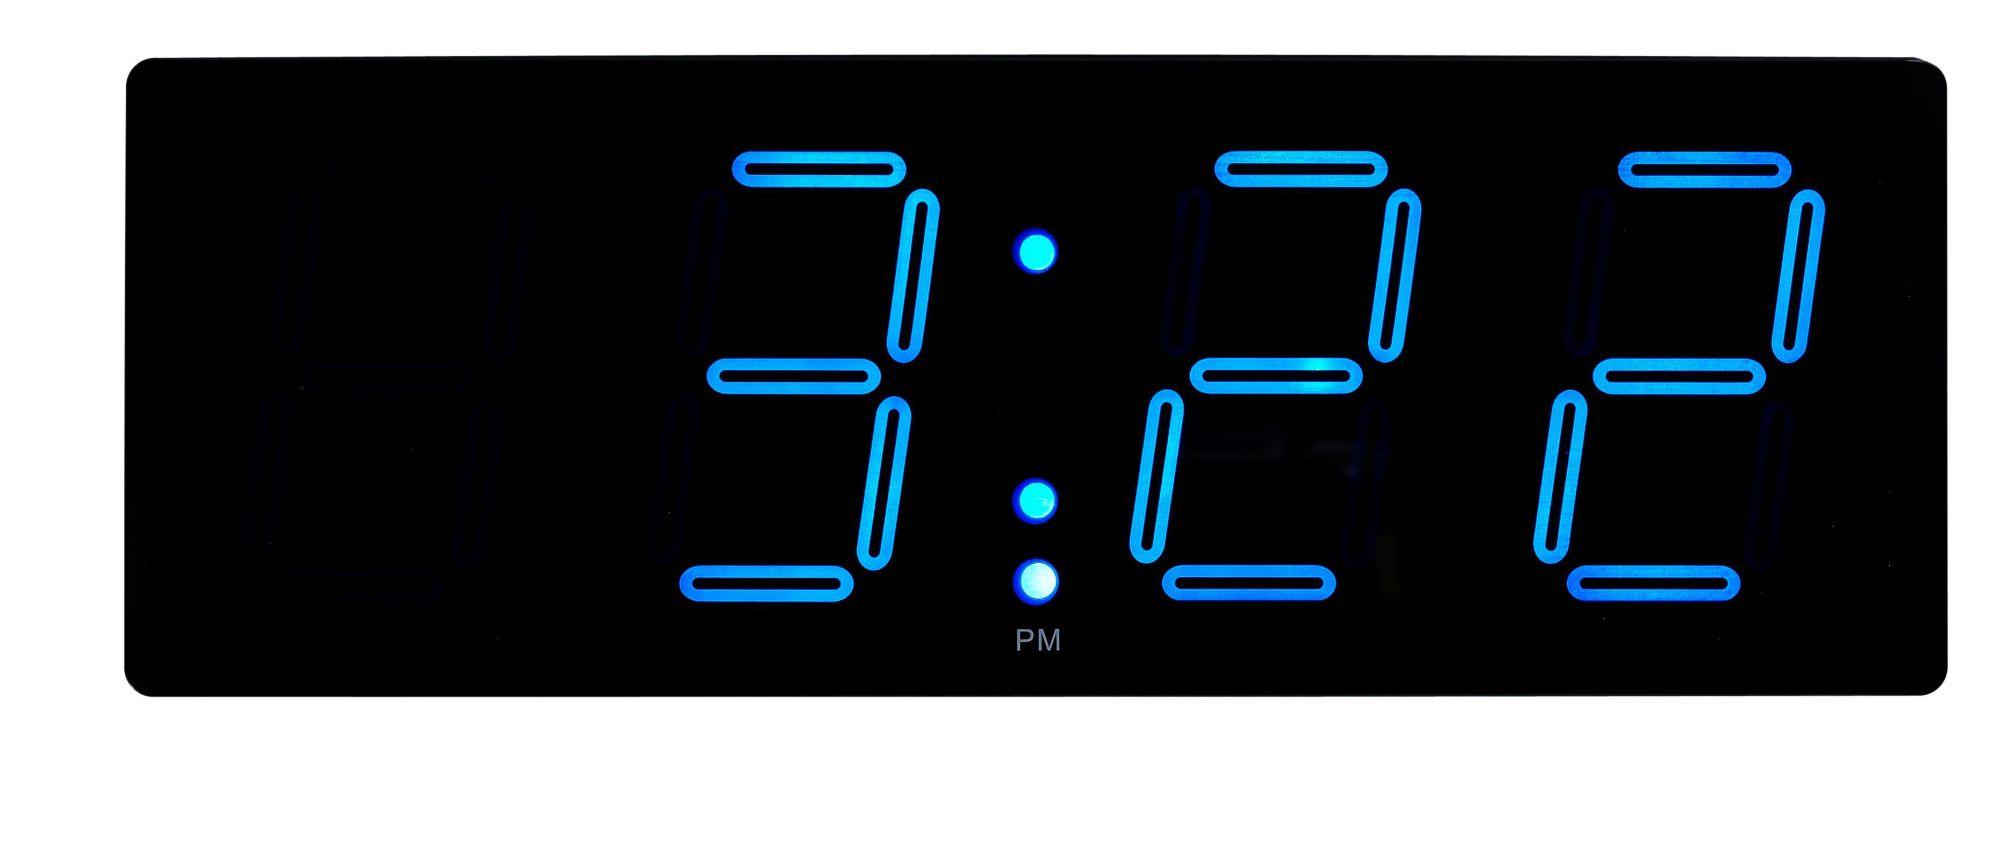 horloge murale digitale 51 6x18 cm noir bleu